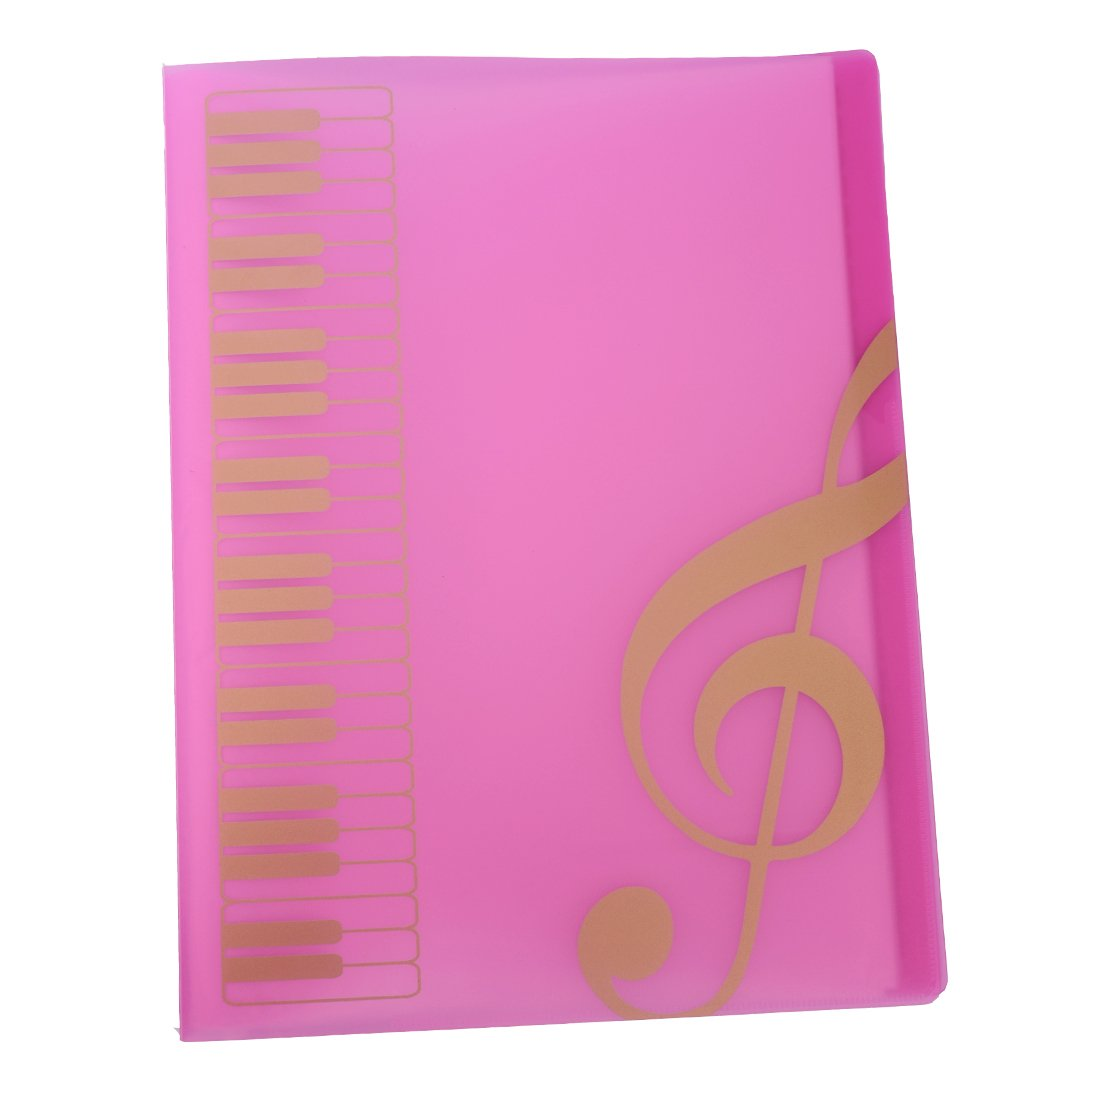 A4 Size,40 Pockets,Sheet Music Folder Files Documents Folder (Black) Rinastore MUS270844